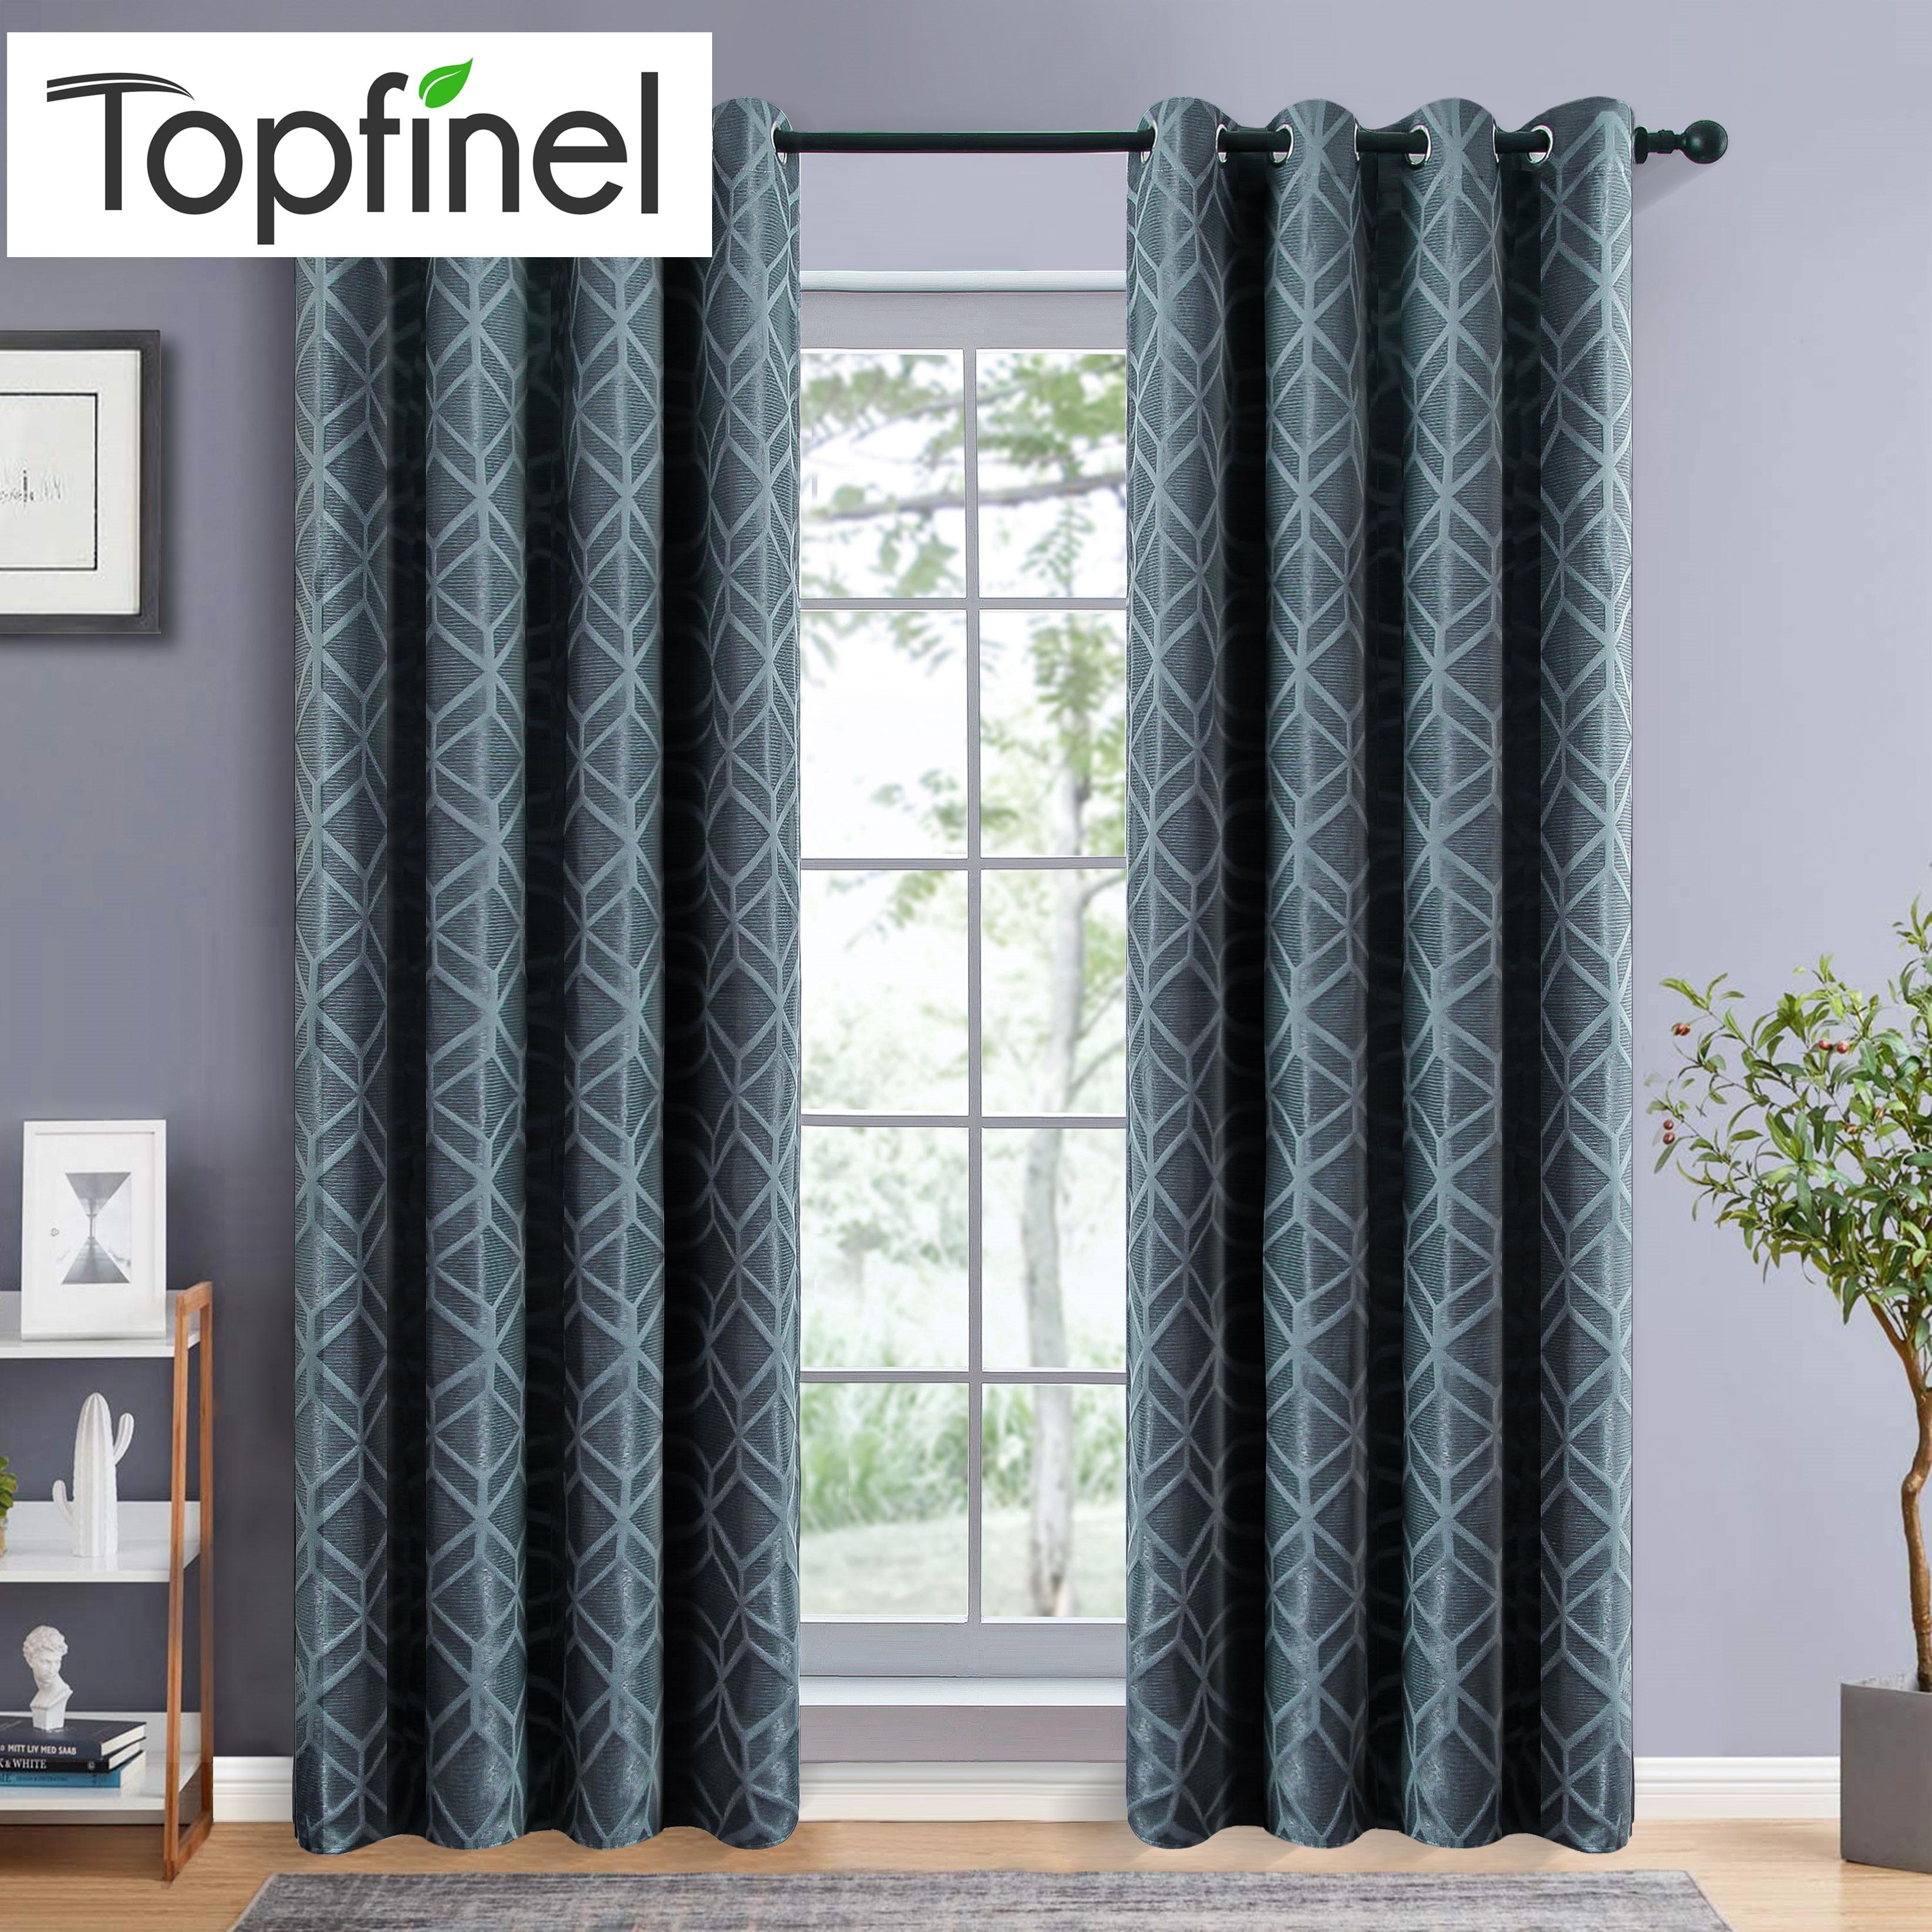 Cortinas opacas Topfinel para dormitorio café sala de estar estilo moderno minimalista Color sólido nórdico cortina de aislamiento térmico